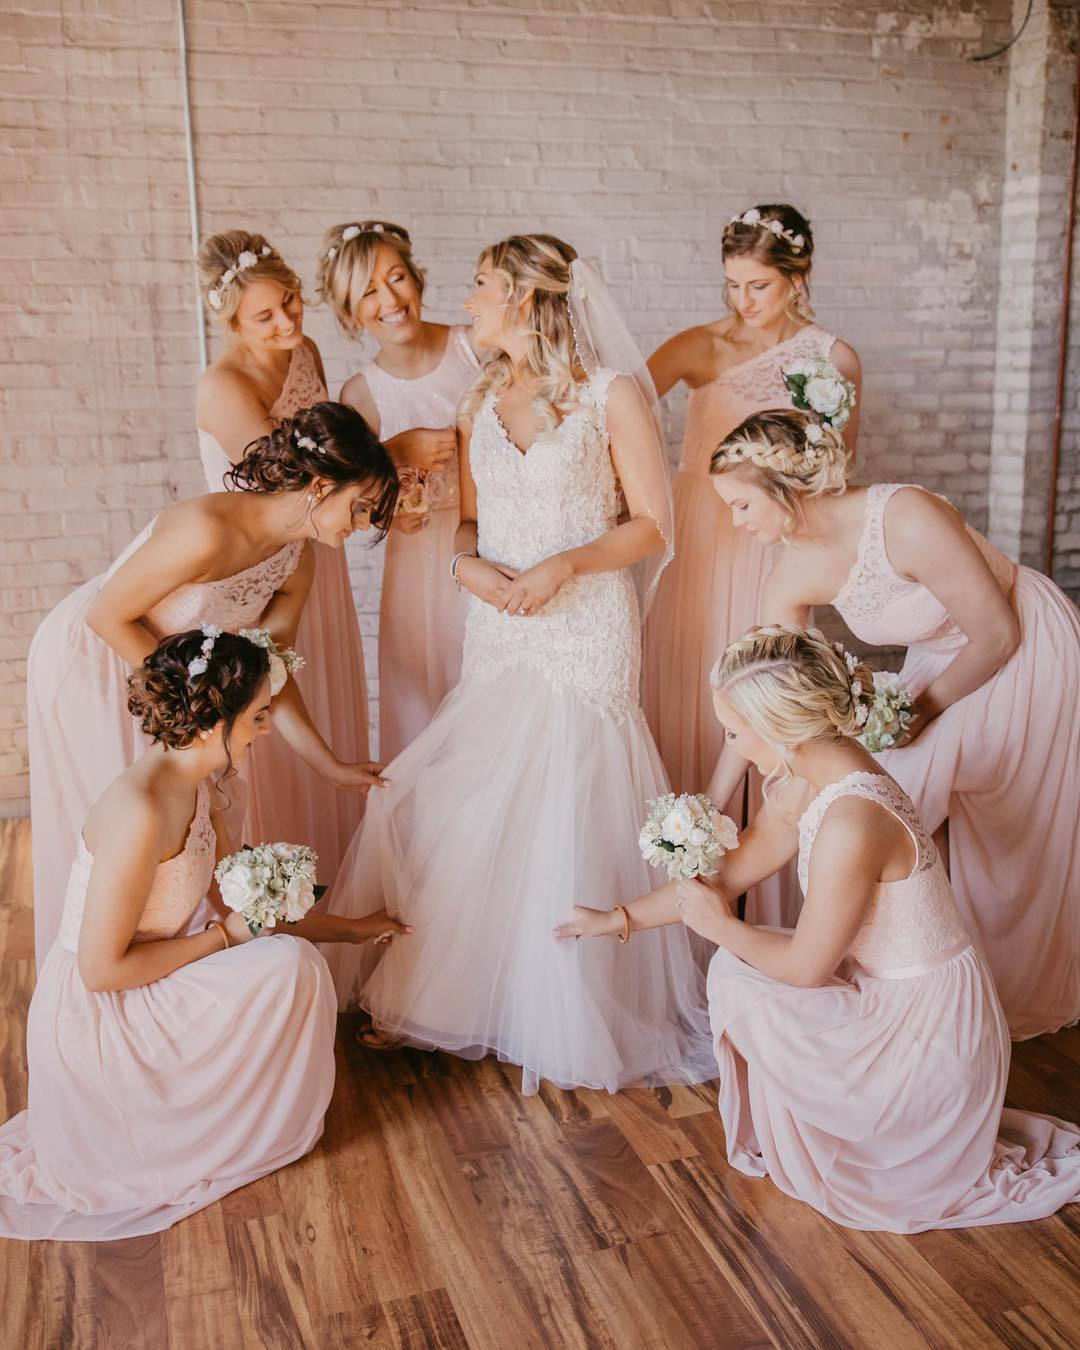 Bridesmaids helping bride get dresses